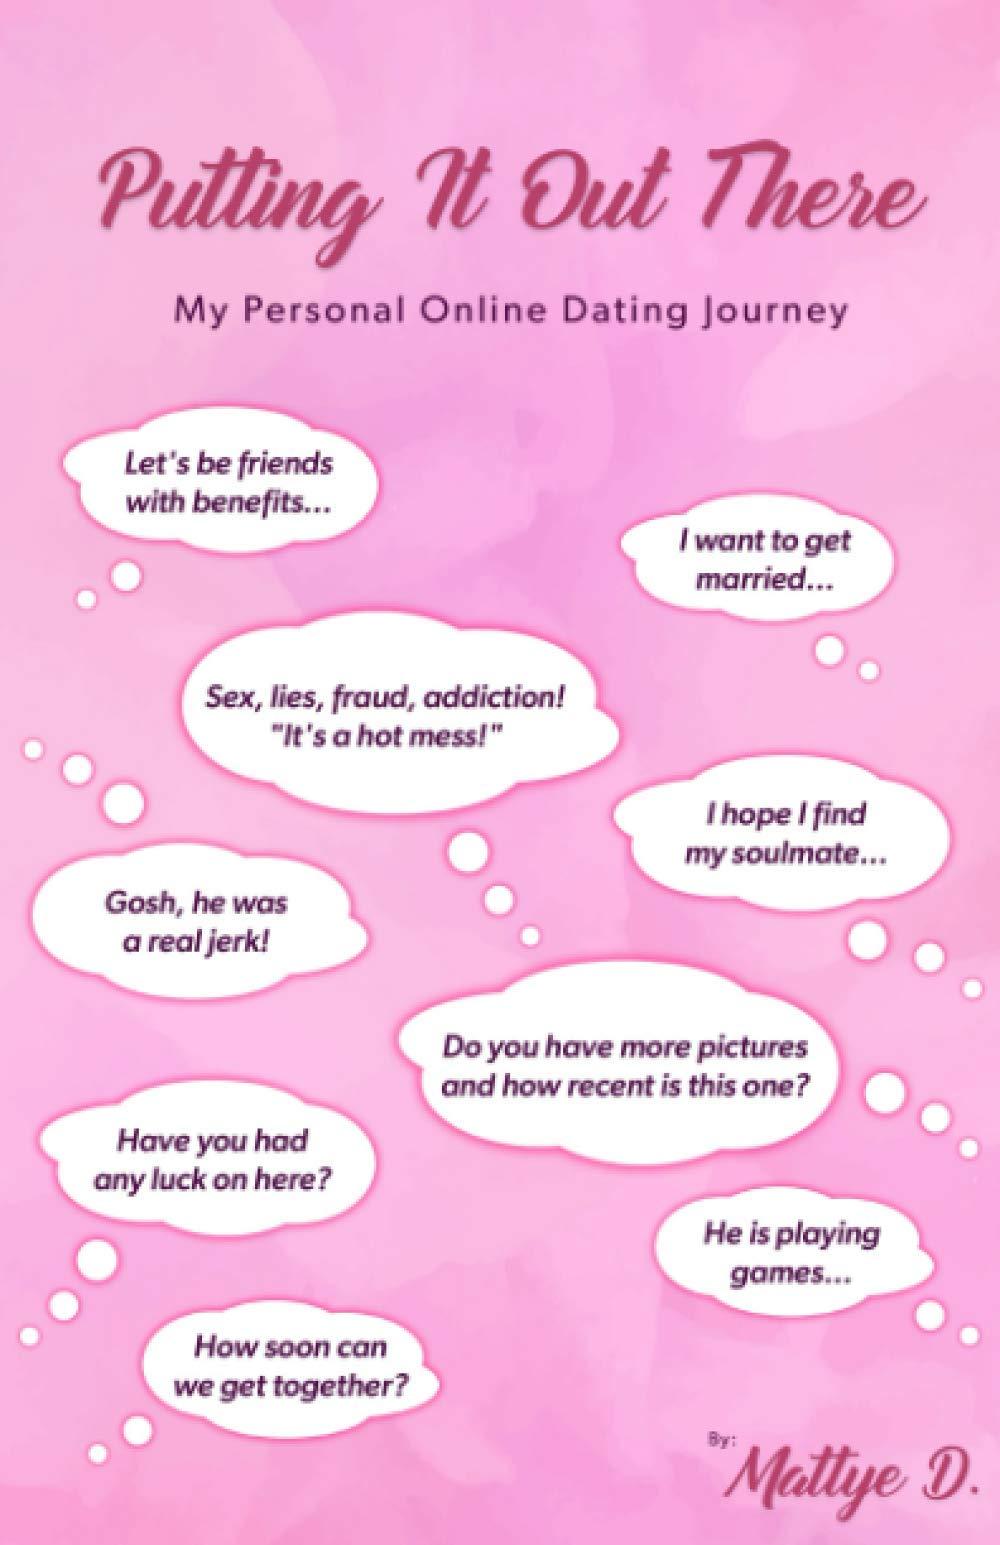 dallas fort worth speed dating site- ul de dating irlandez